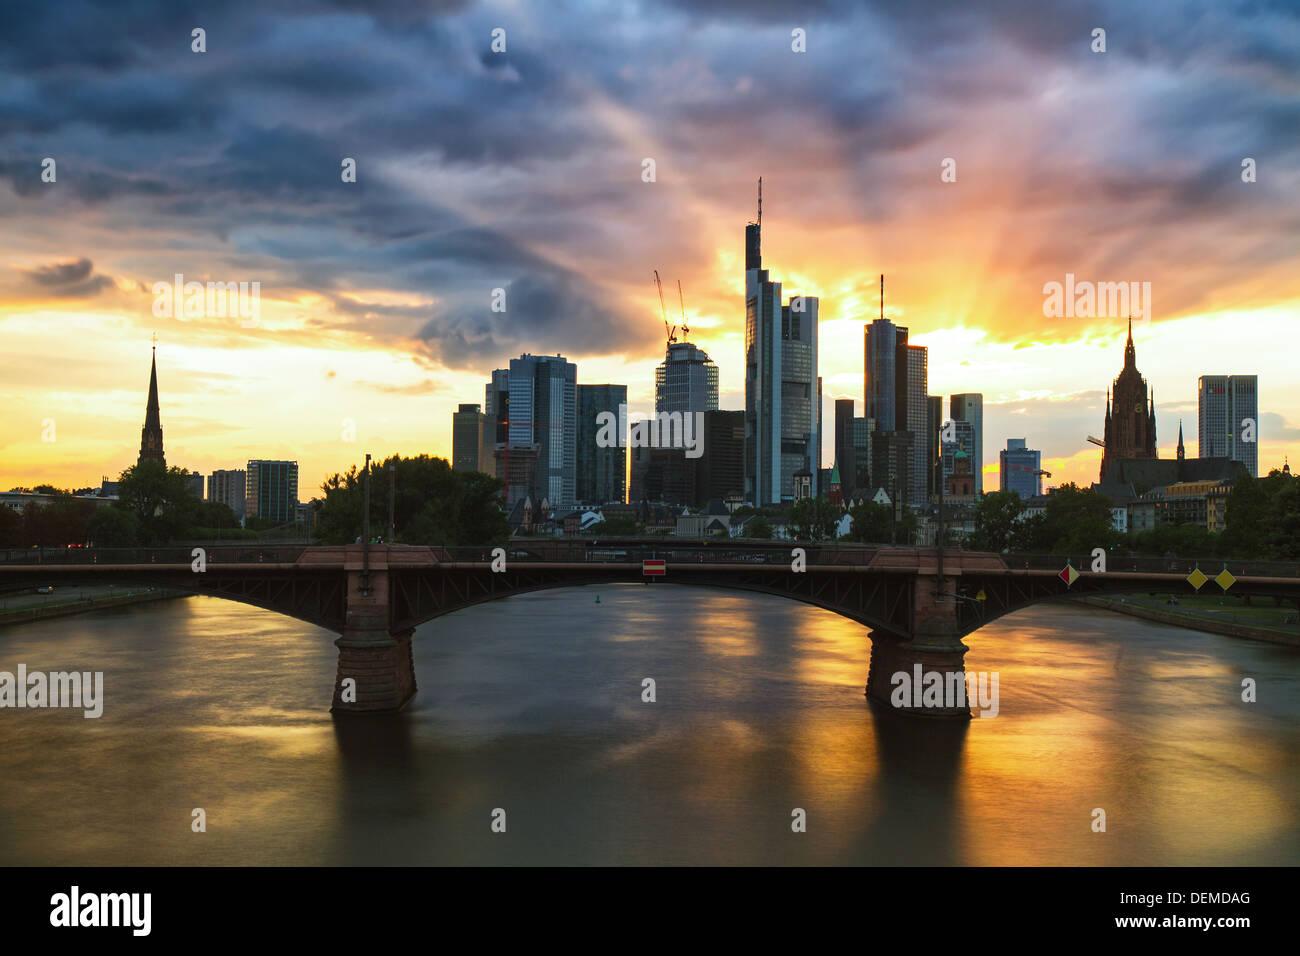 Sunrays on the skyline of Frankfurt, Germany - Stock Image